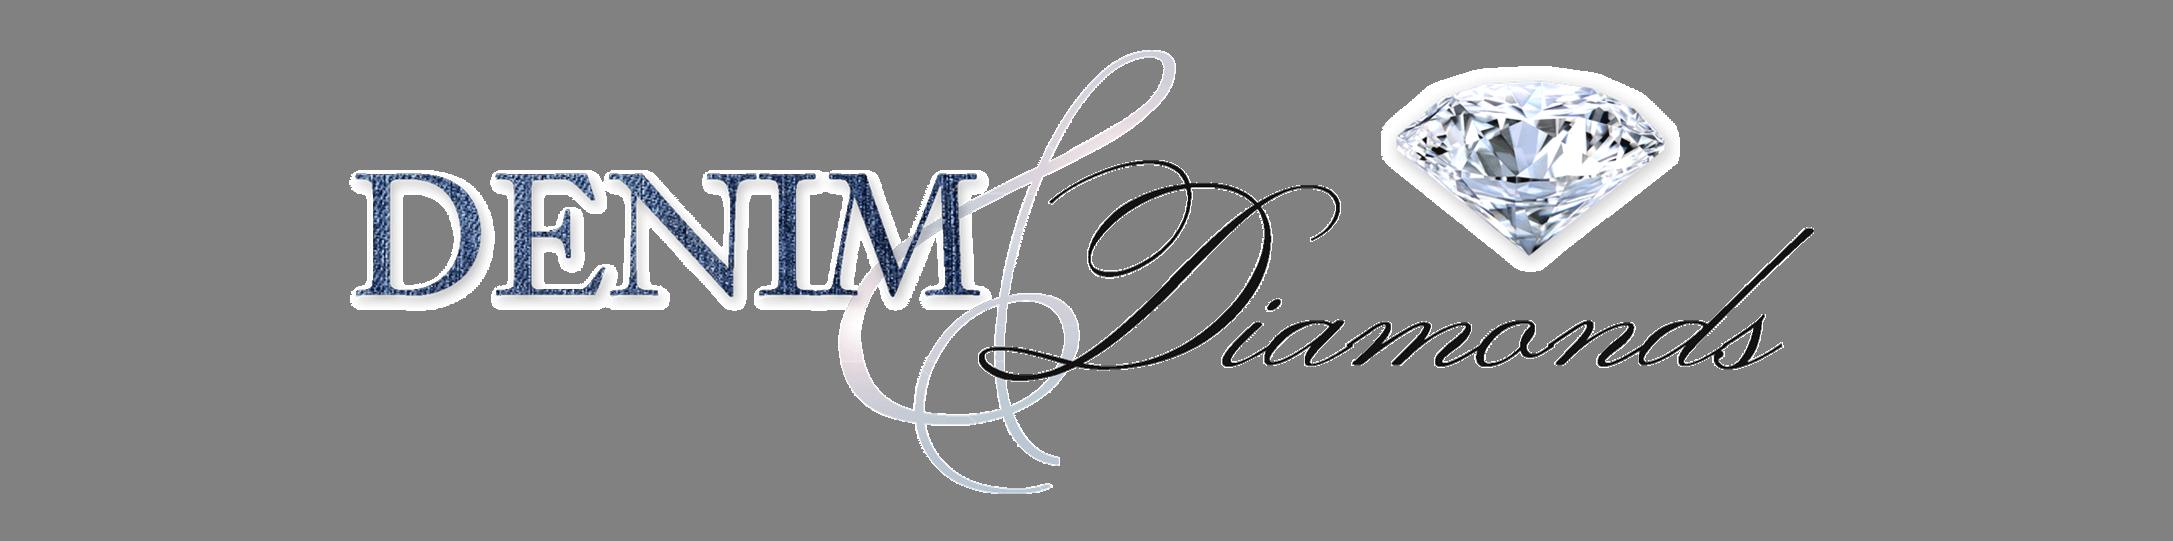 denim diamonds logo 2015